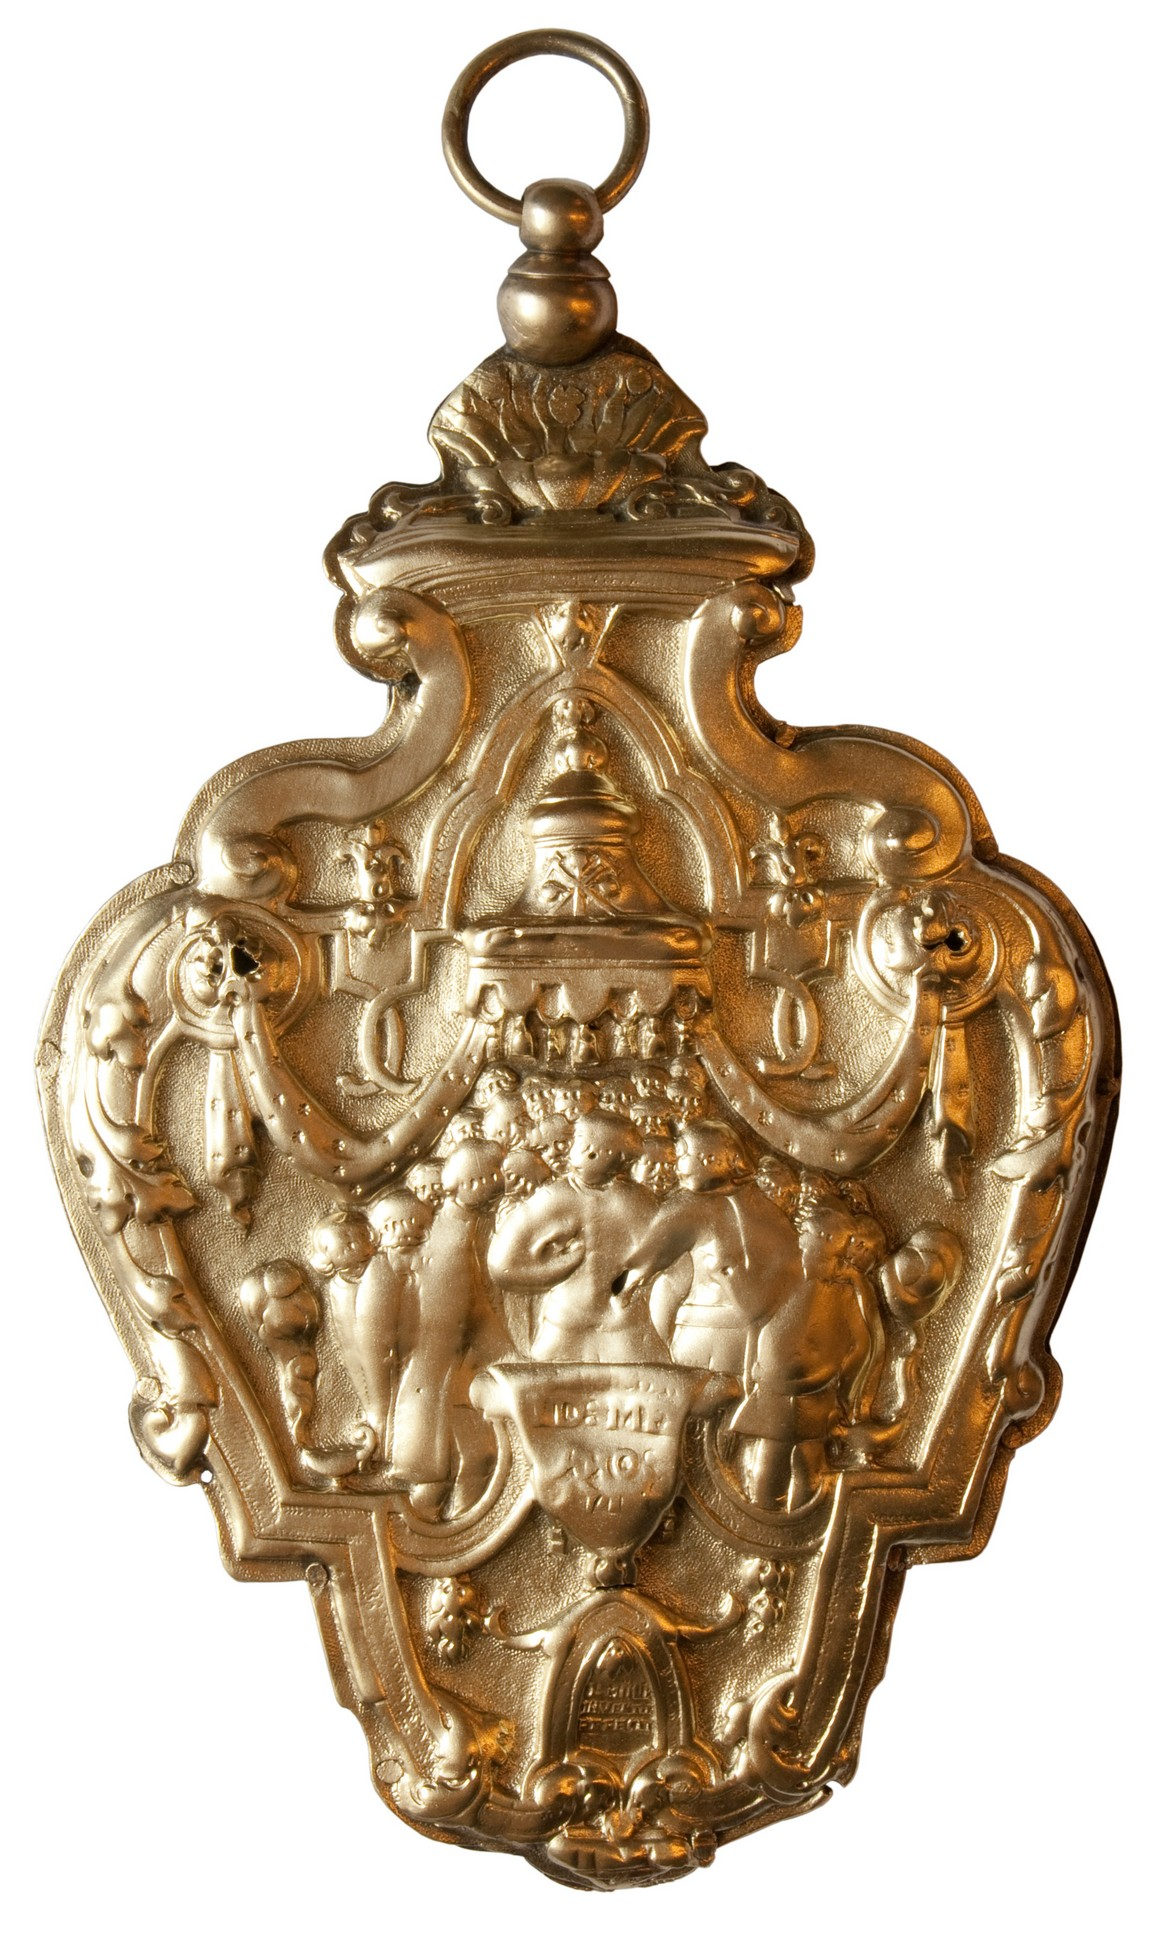 zvolavacia-tabulka-roznavskeho-banickeho-cechu-1714-foto-s-fabian